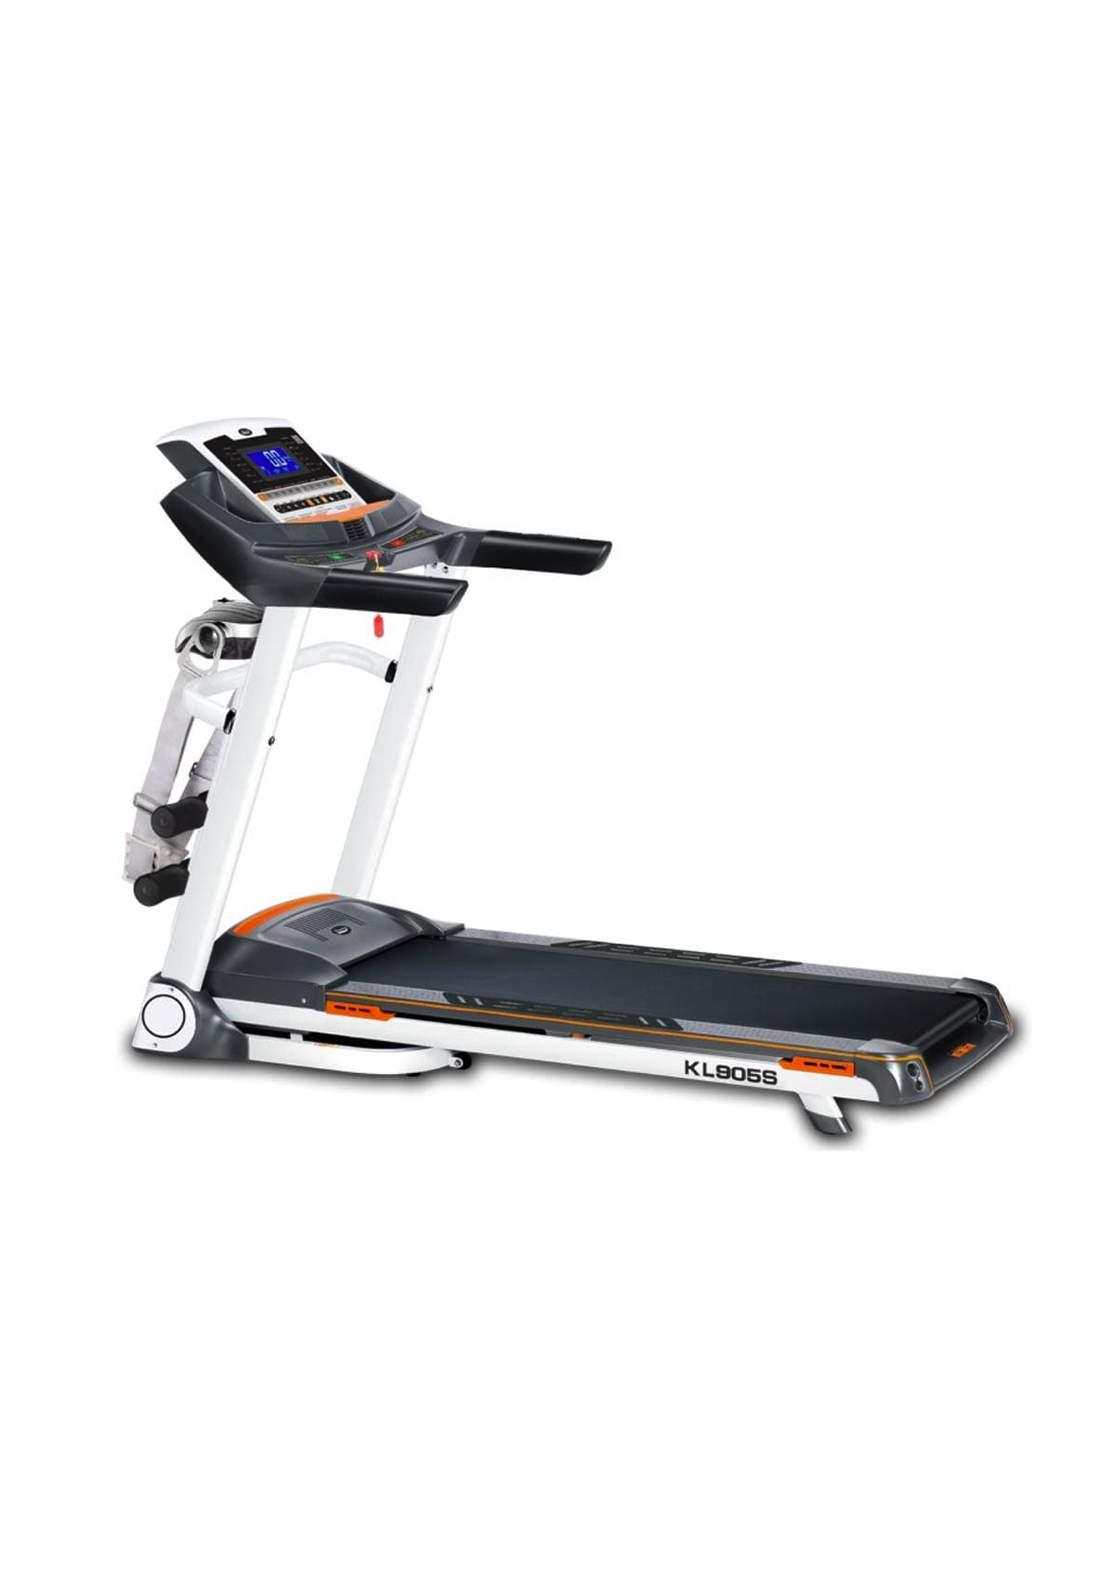 KL905S Treadmill  2.5 H DC جهاز جري دبل ماطور